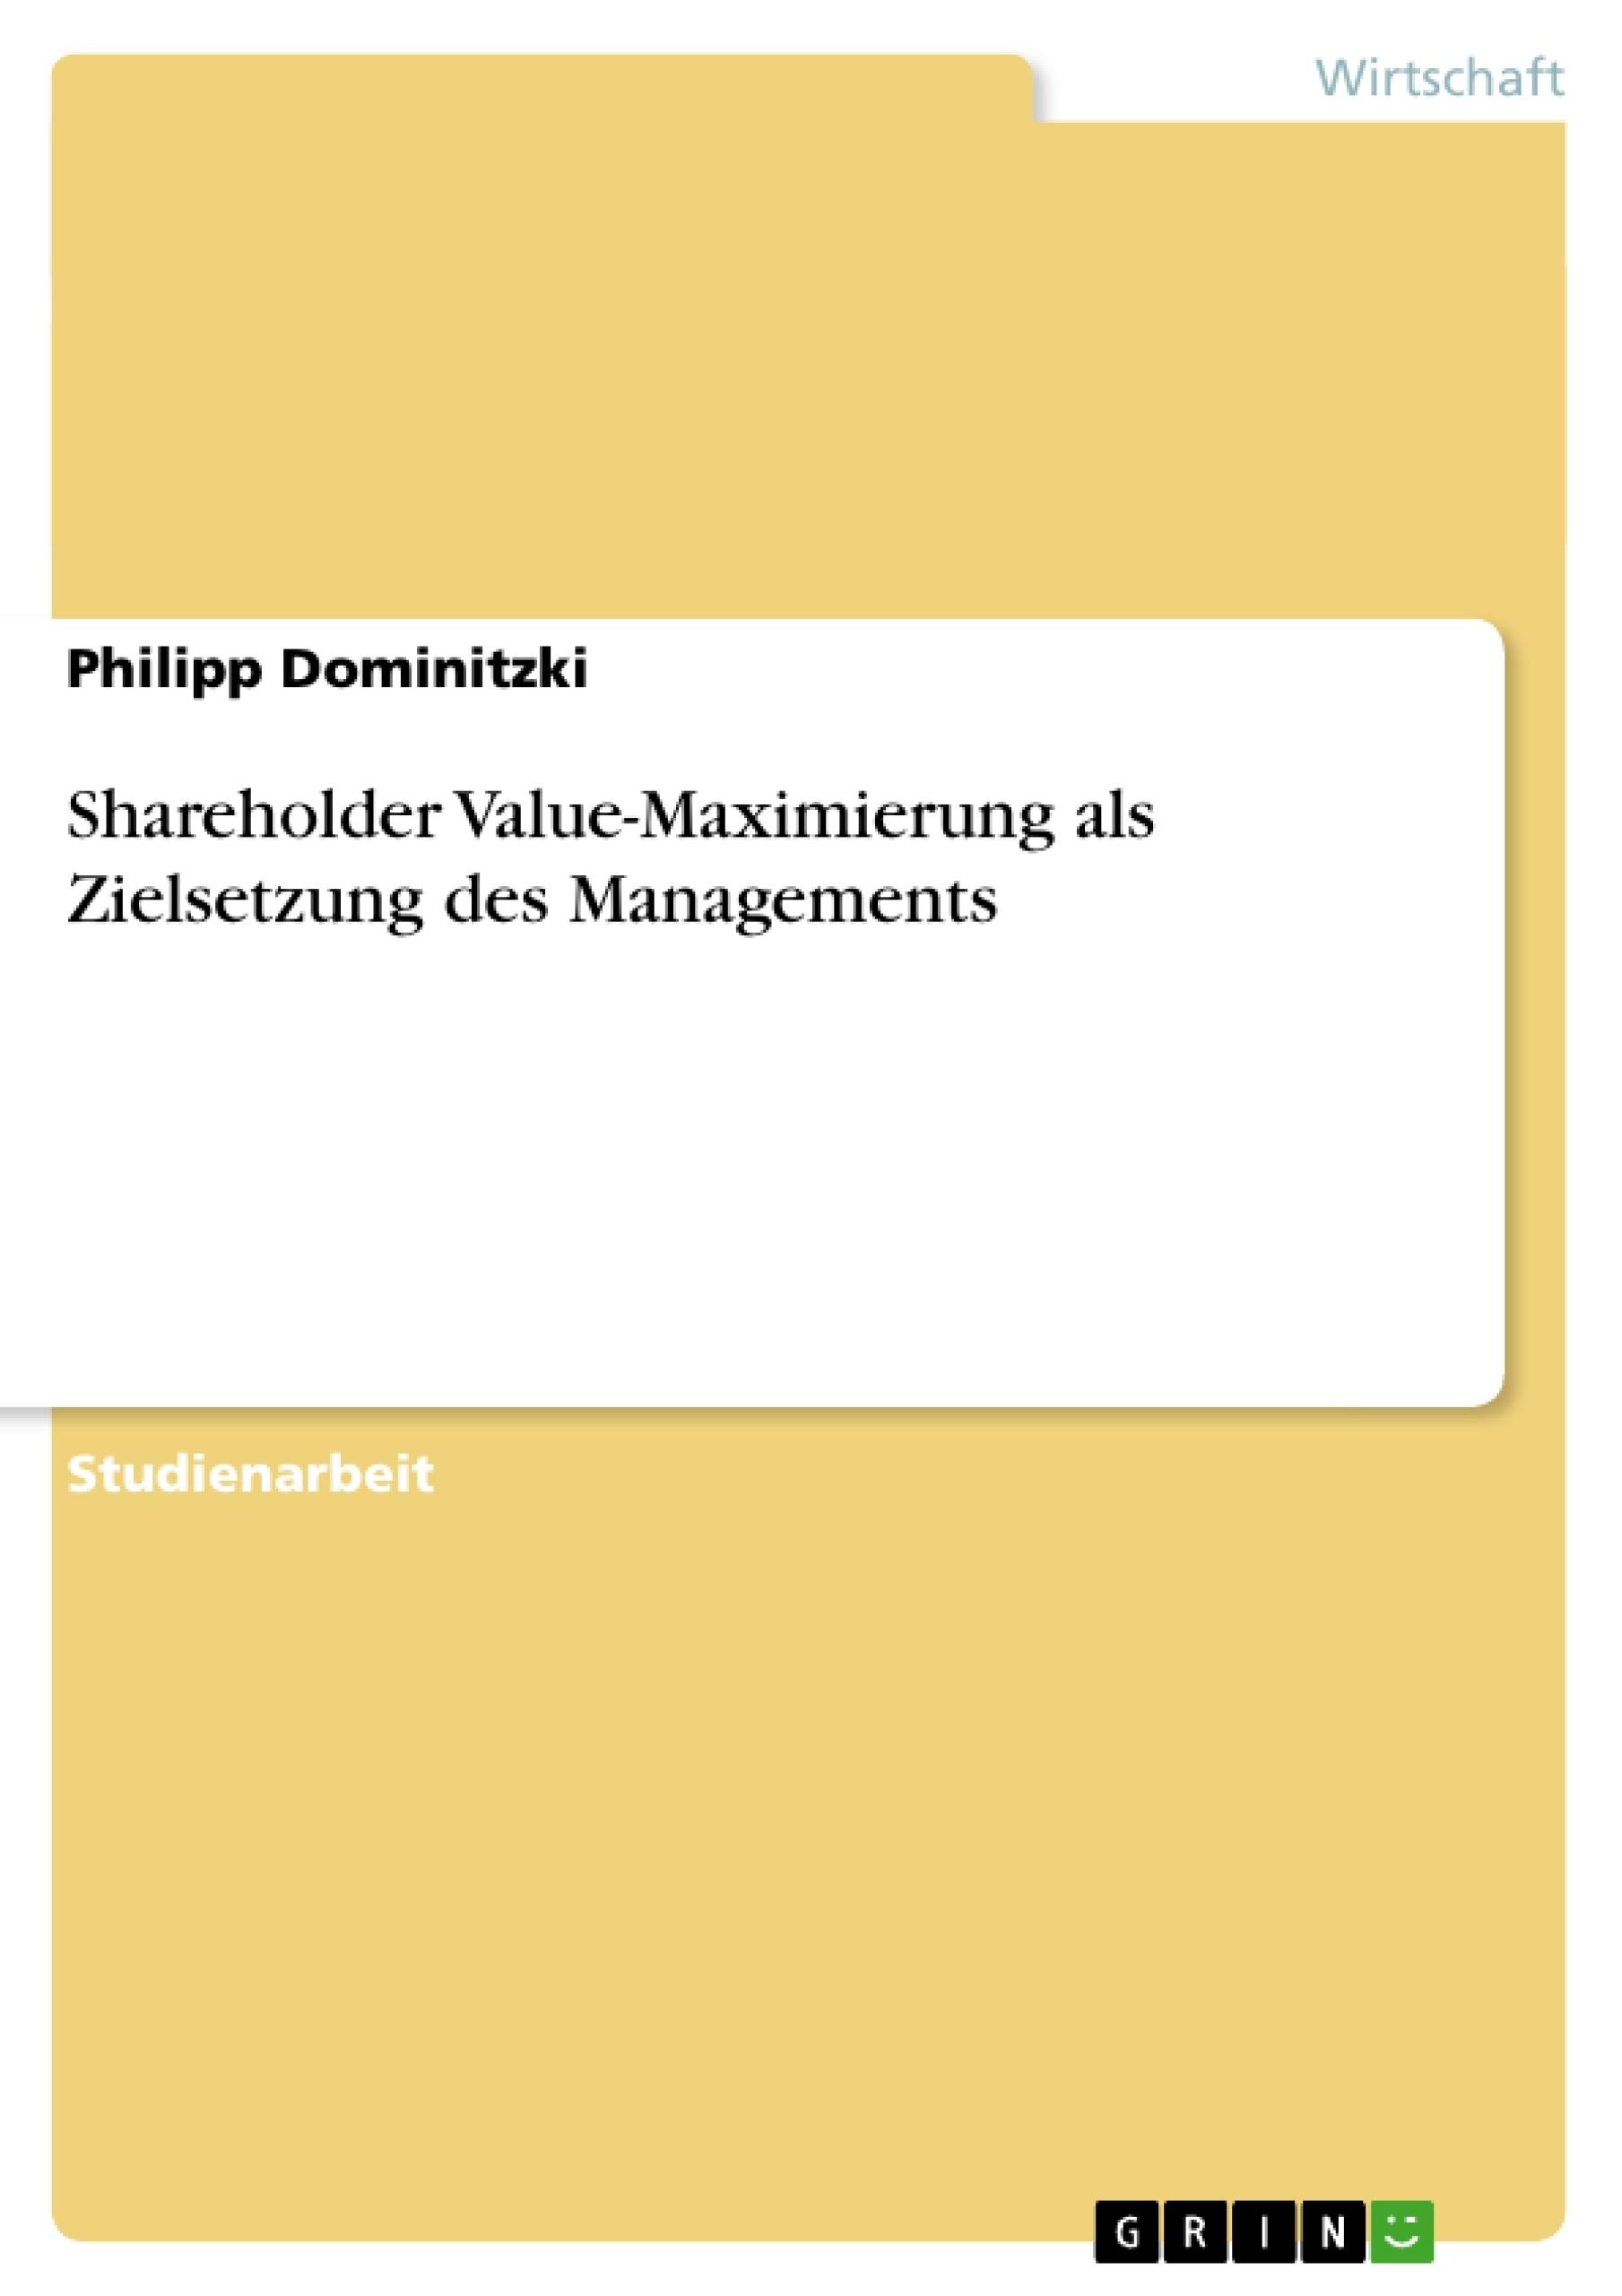 Titel: Shareholder Value-Maximierung als Zielsetzung des Managements